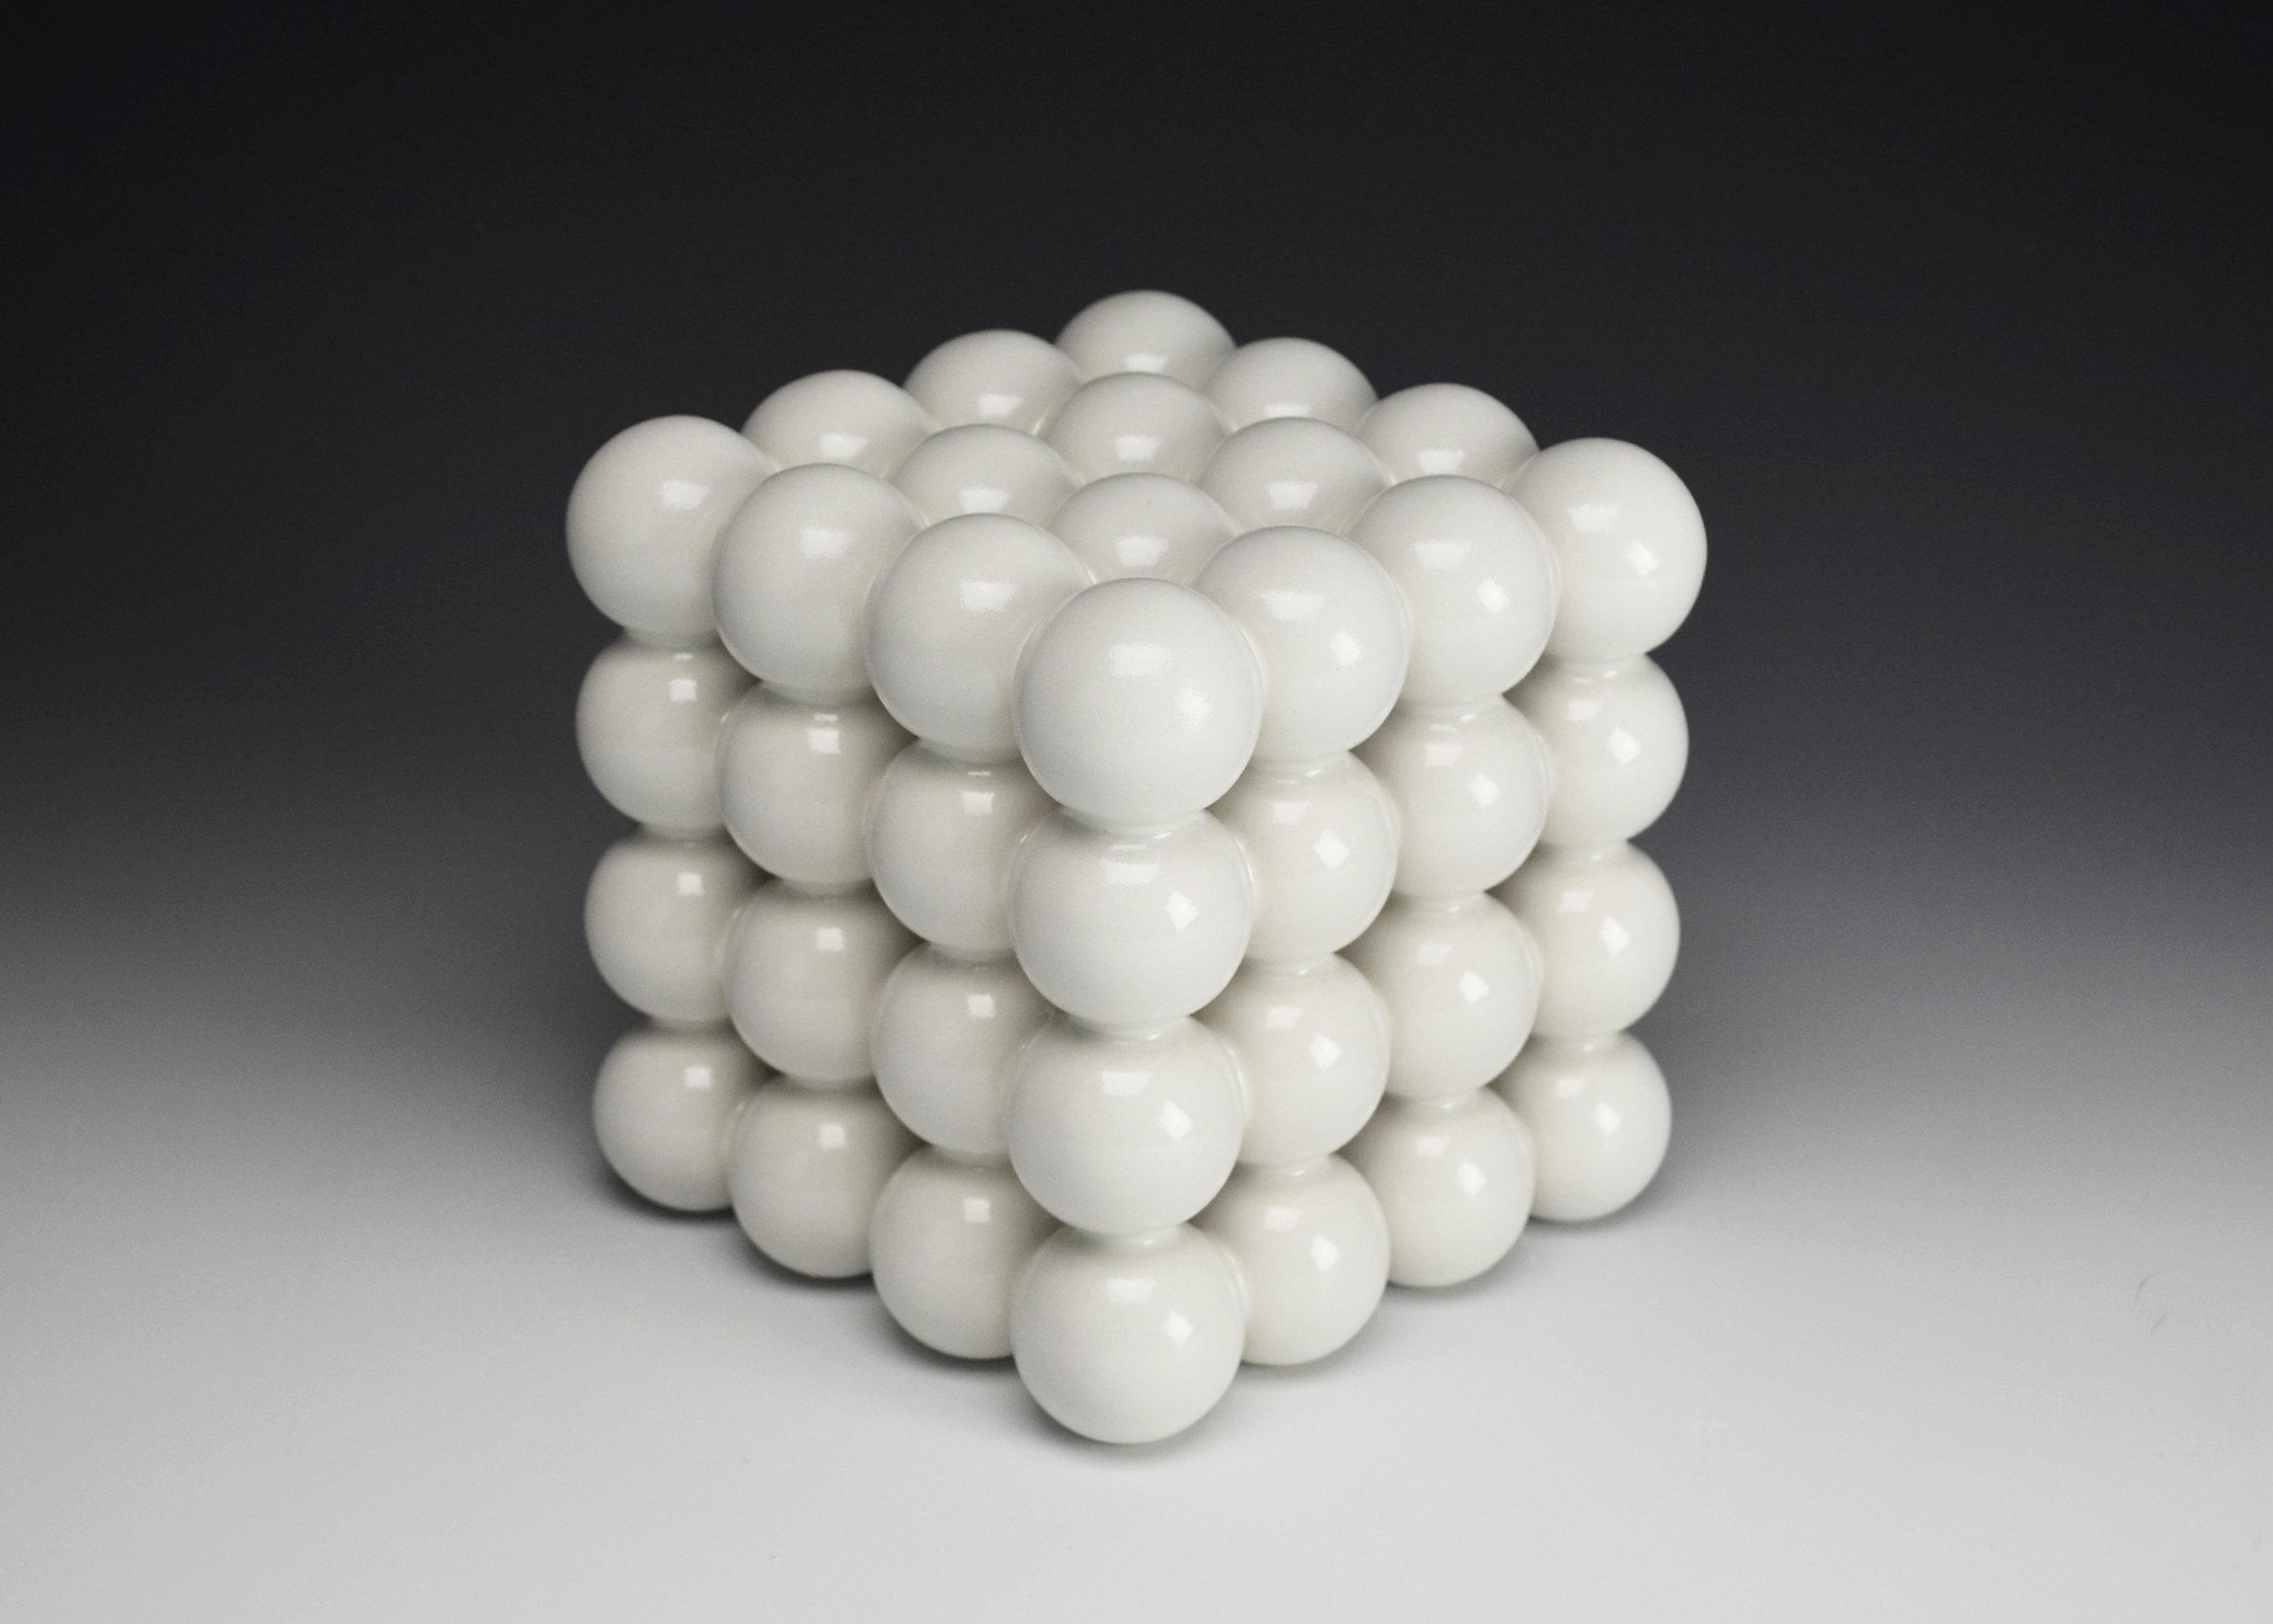 Ionic Series: Construction IV  |  5.5 x 5.5 x 5.5 inches  |  Porcelain, Glaze  |  2017